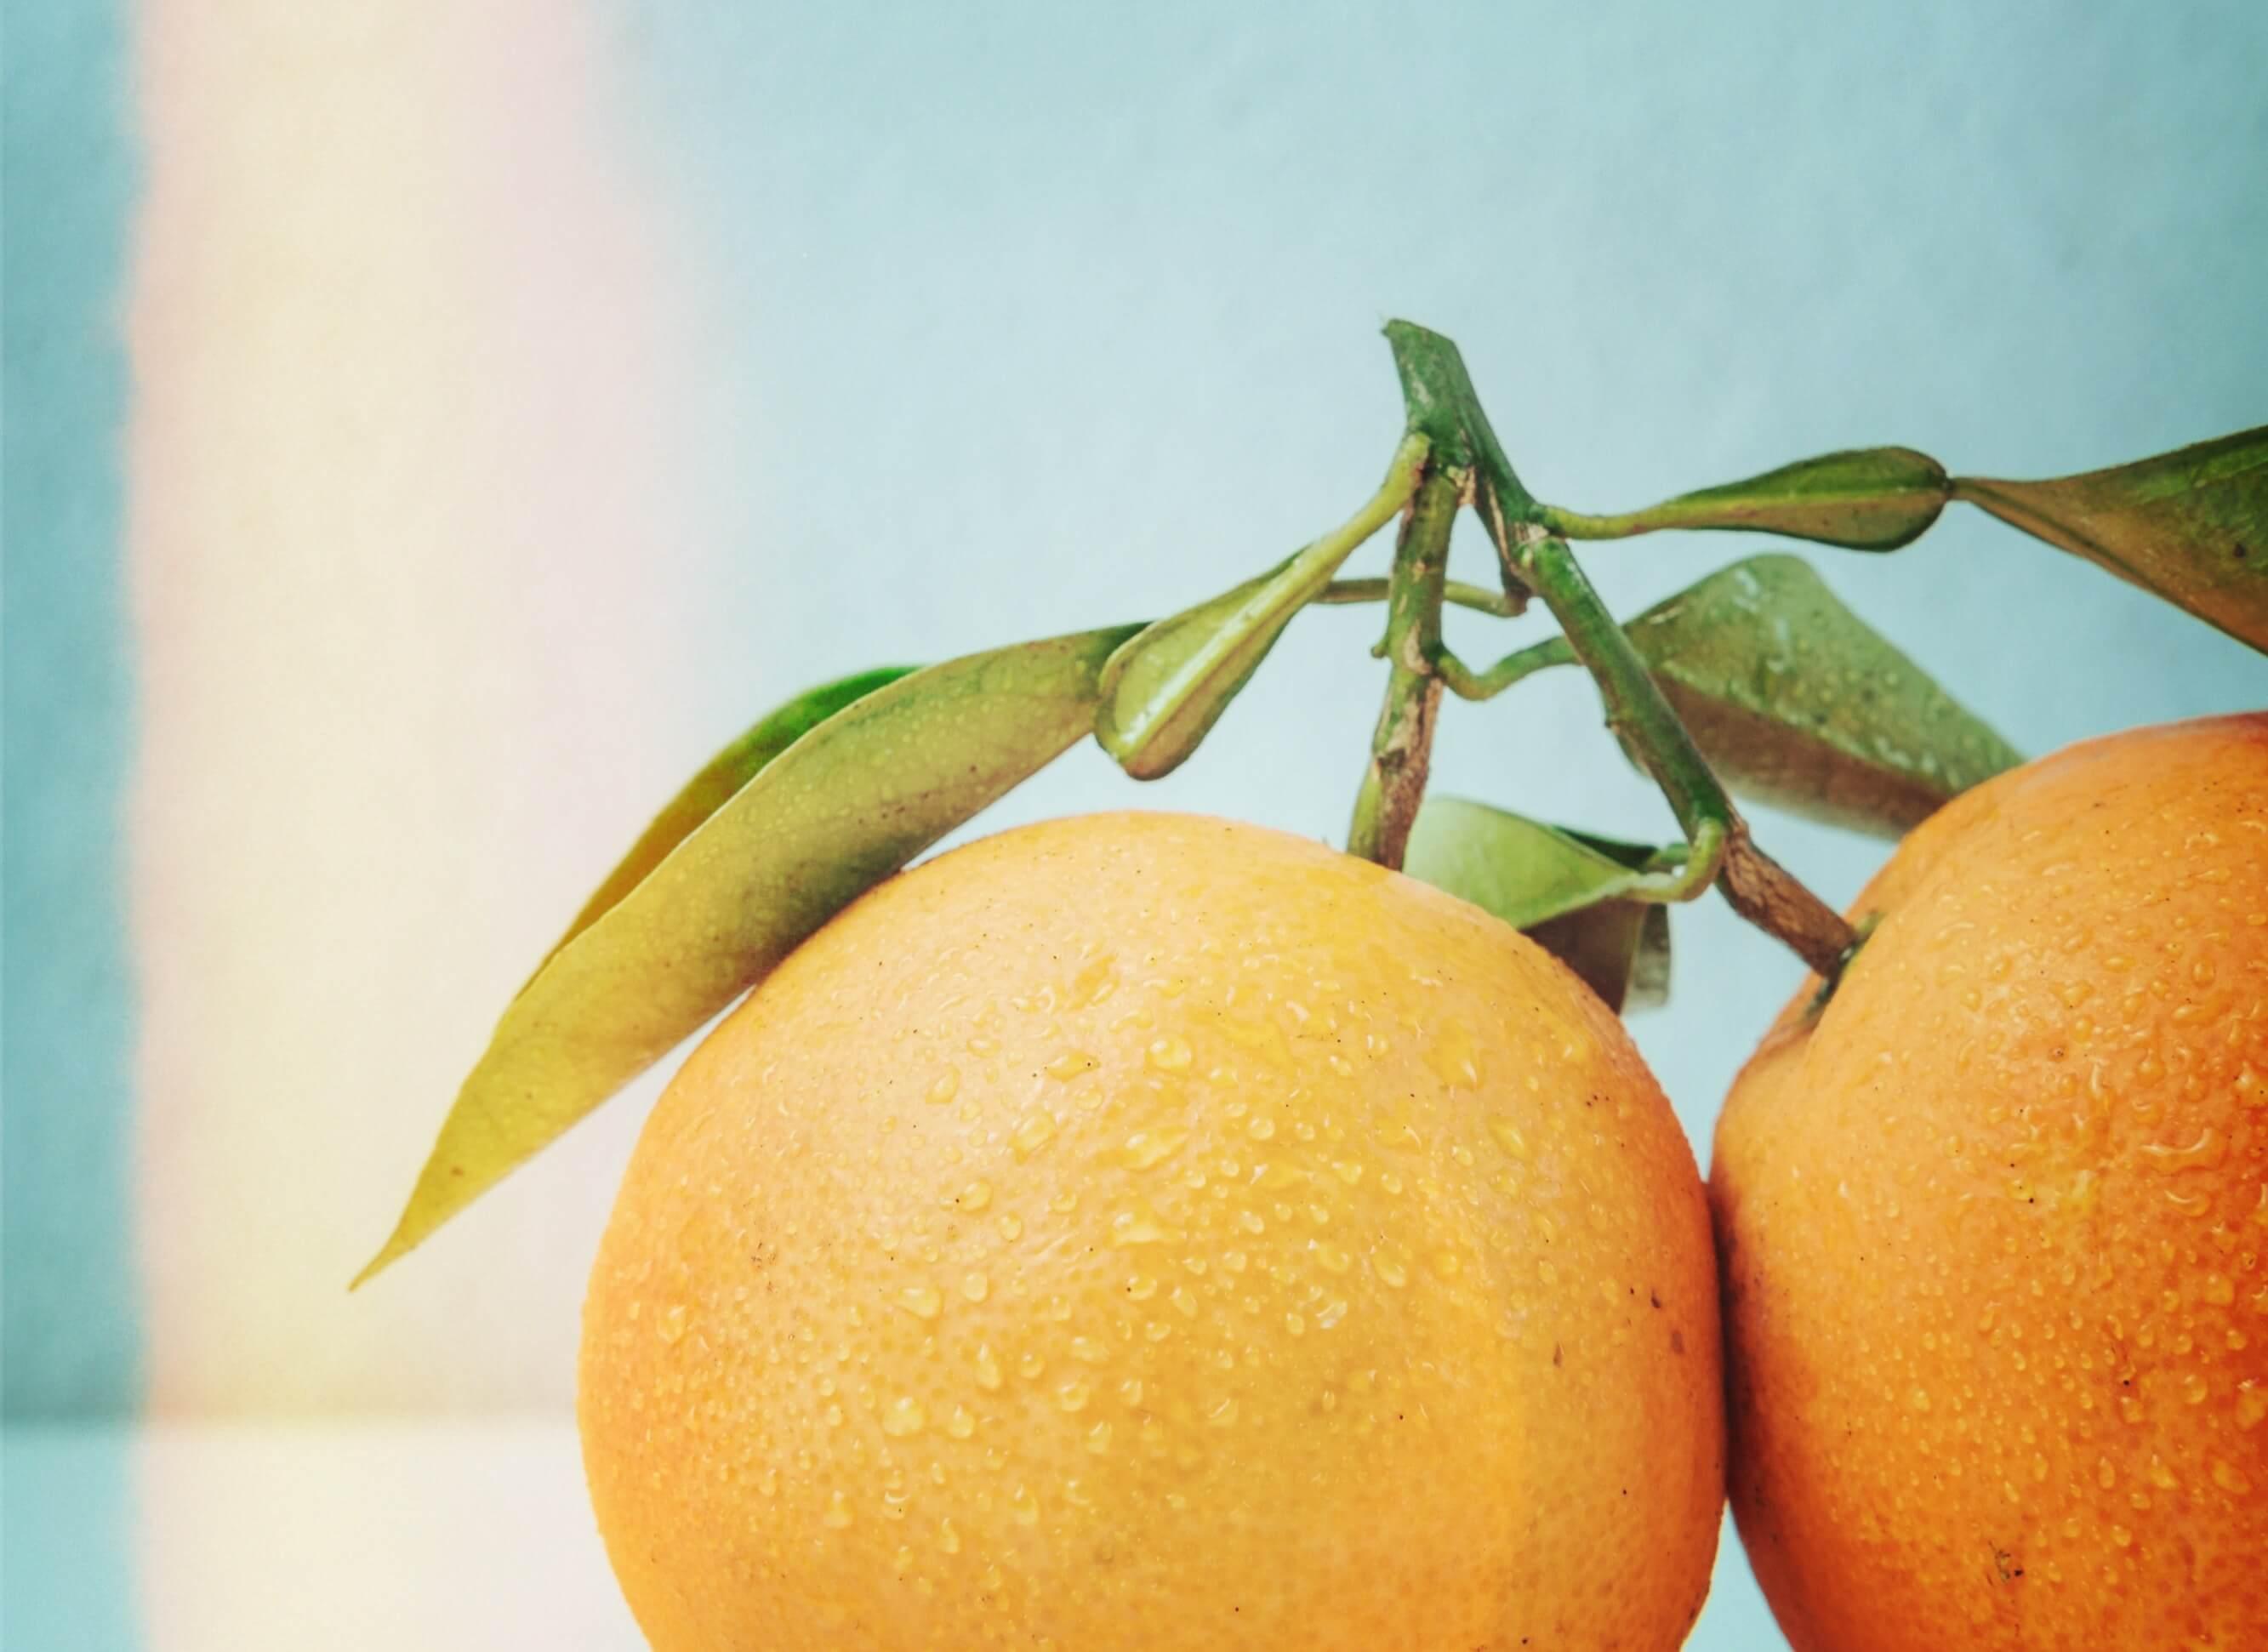 naranja con efecto funky